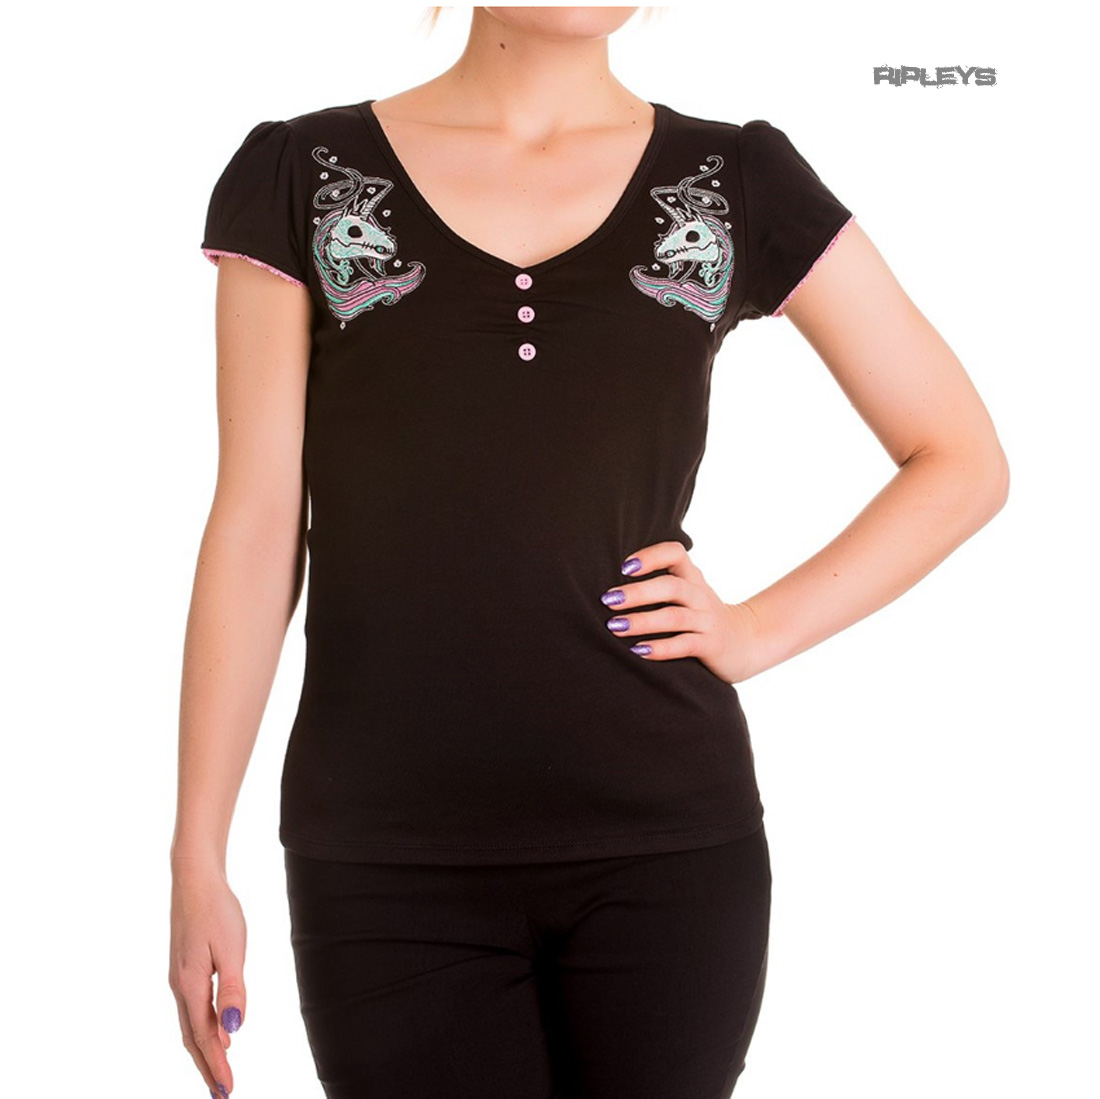 Hell-Bunny-Top-Shirt-Black-Baby-Pink-RARITY-Unicorn-Skull-All-Sizes thumbnail 2